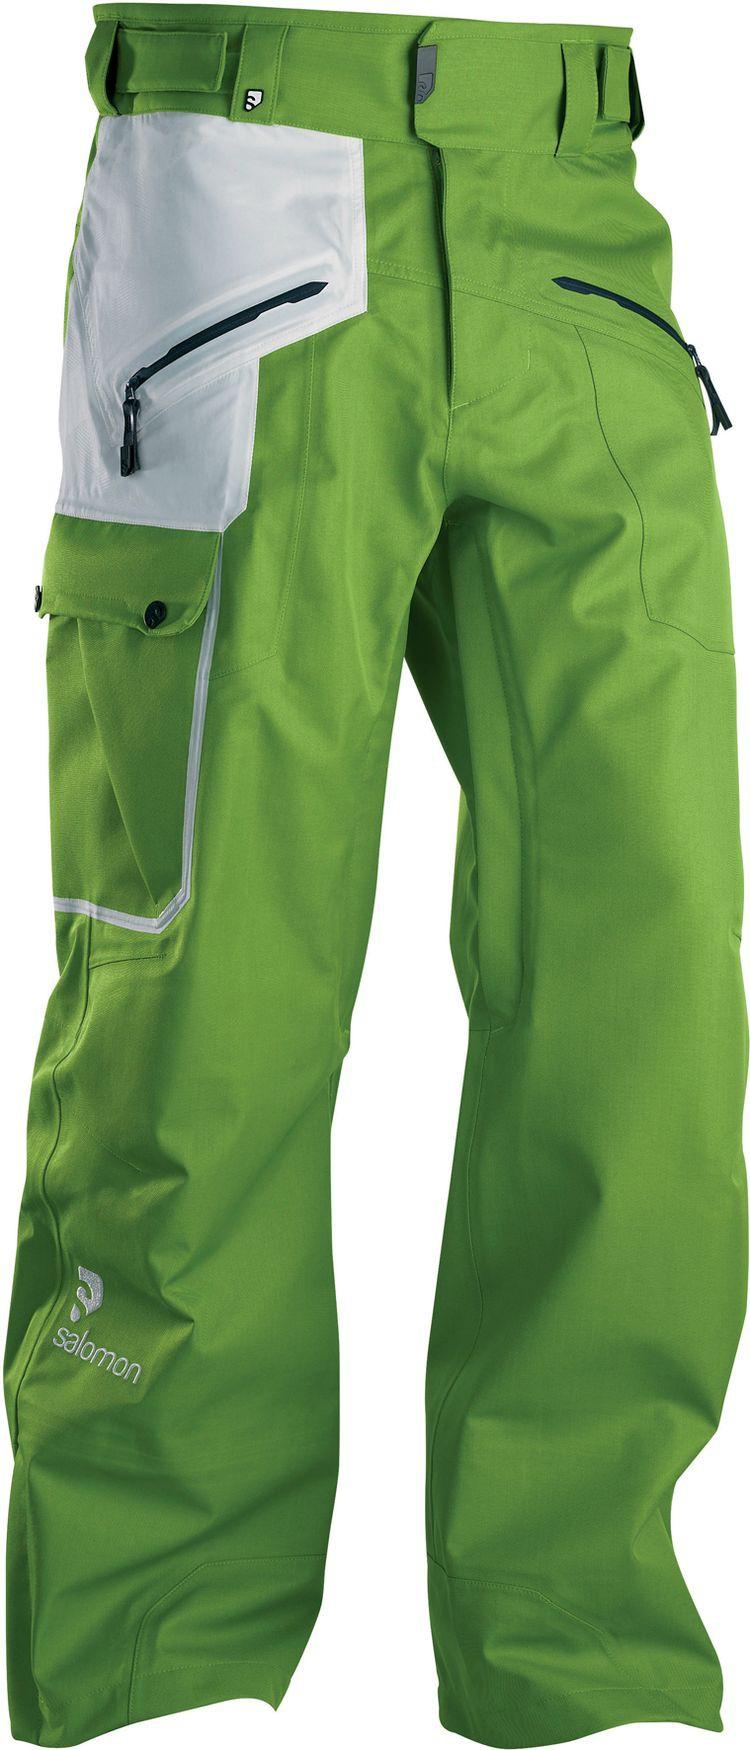 Sideways Pant